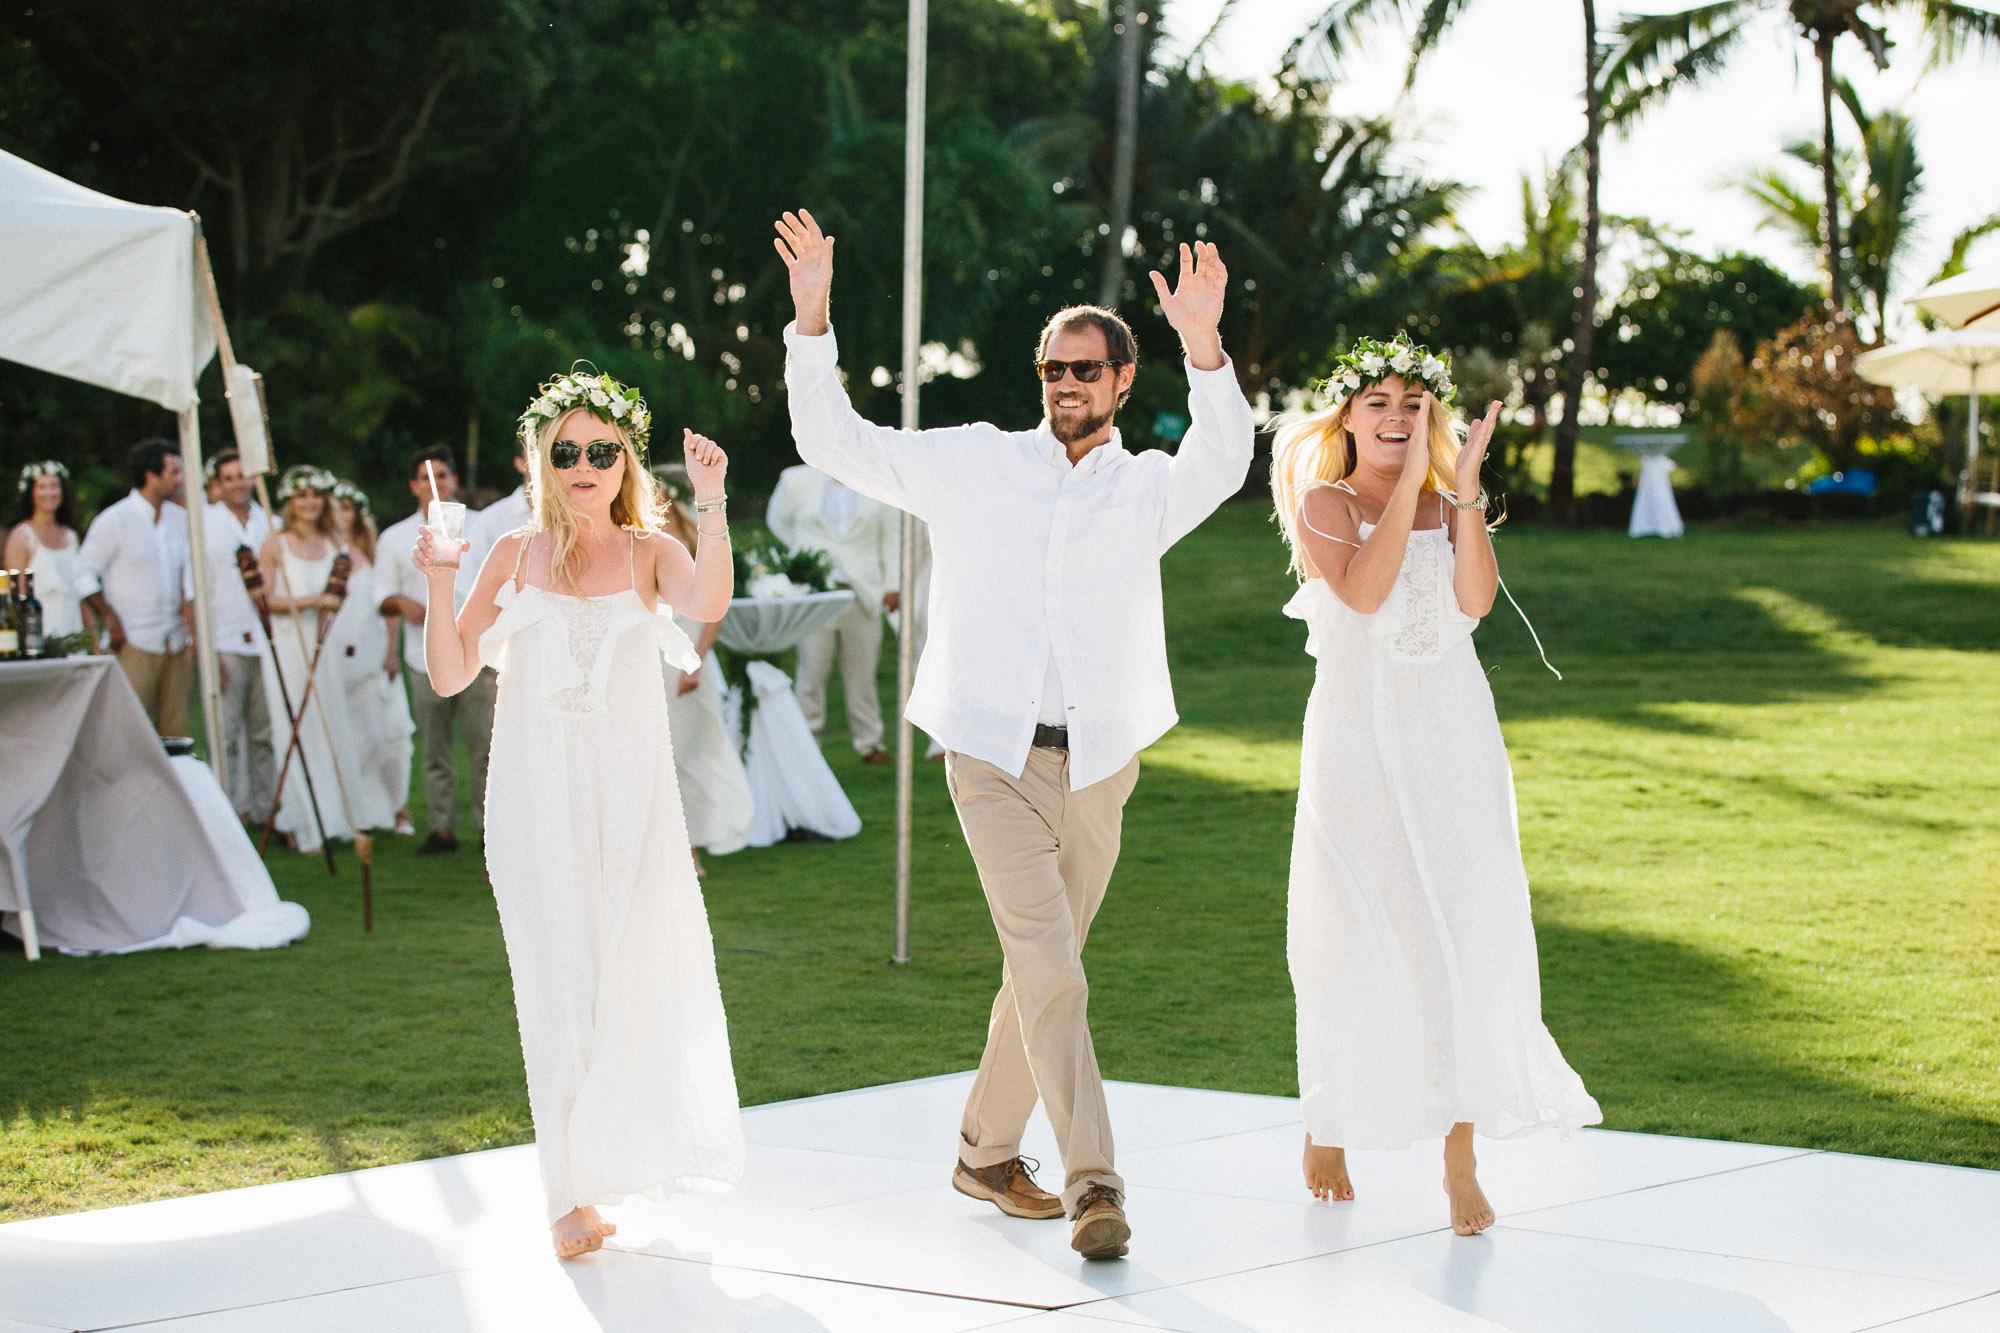 Bridal Party Reception Entrance at Loulu Palm Farm Estate